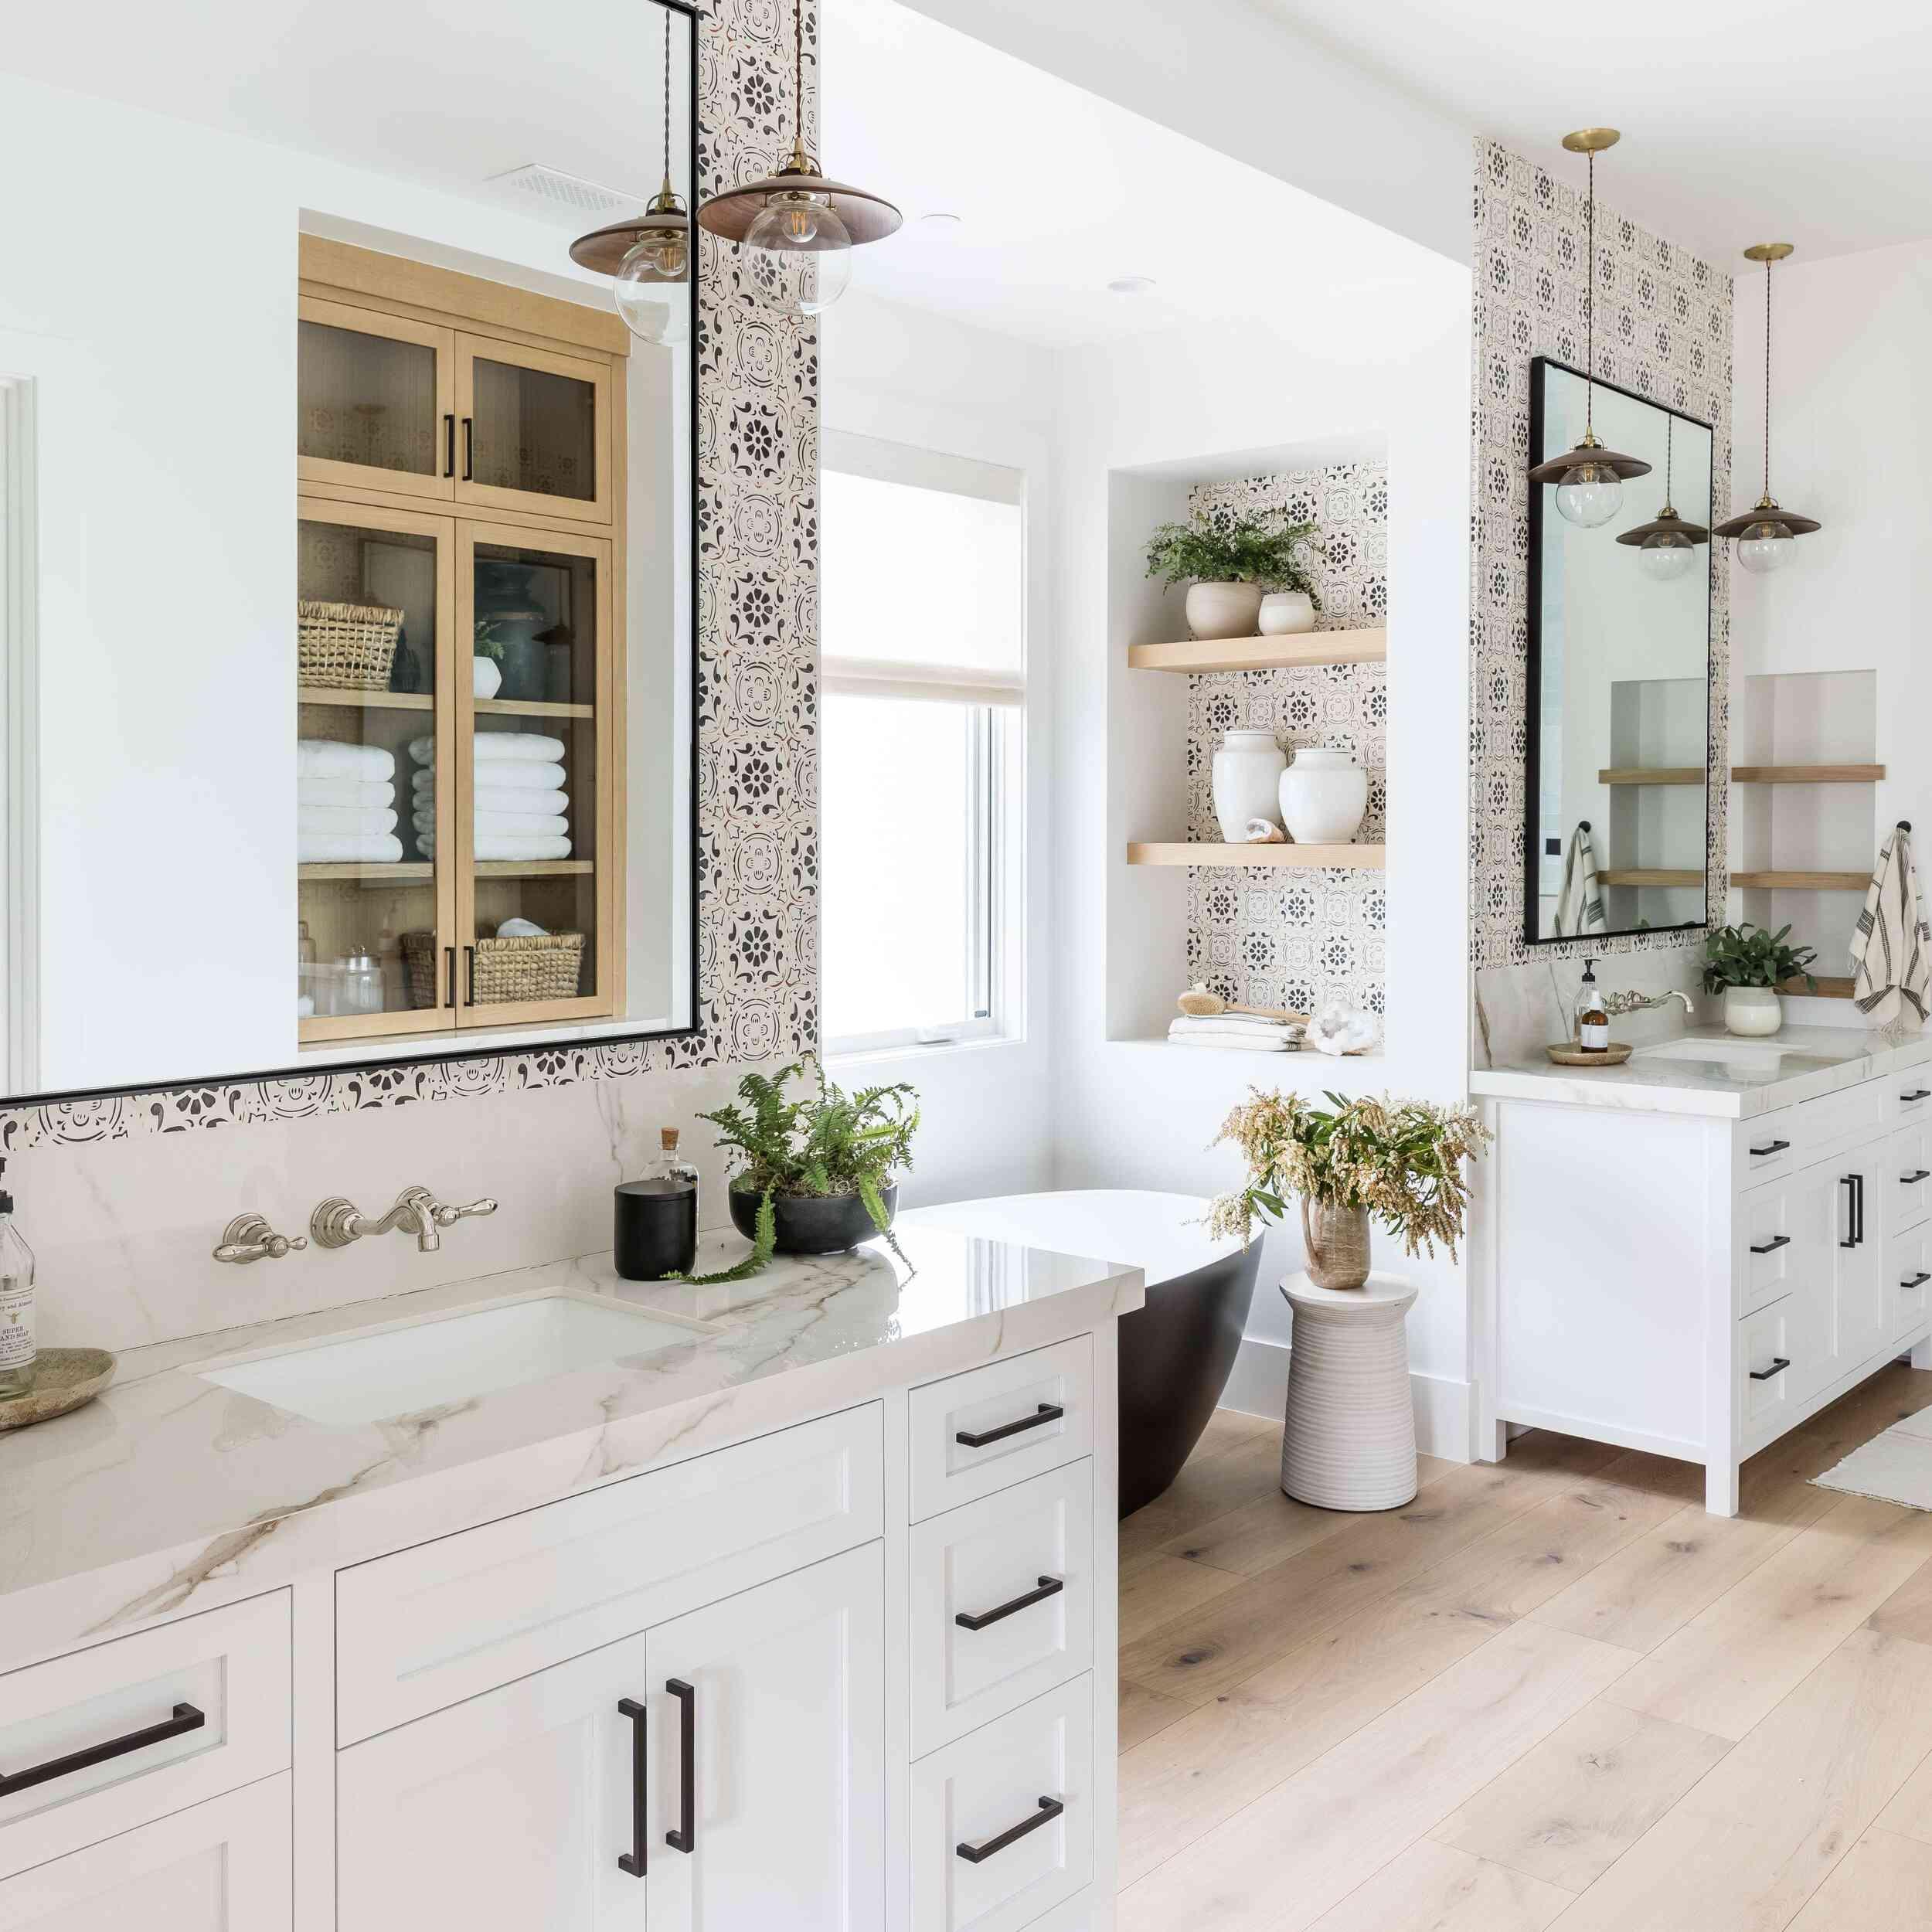 bathroom with tile-look wallpaper